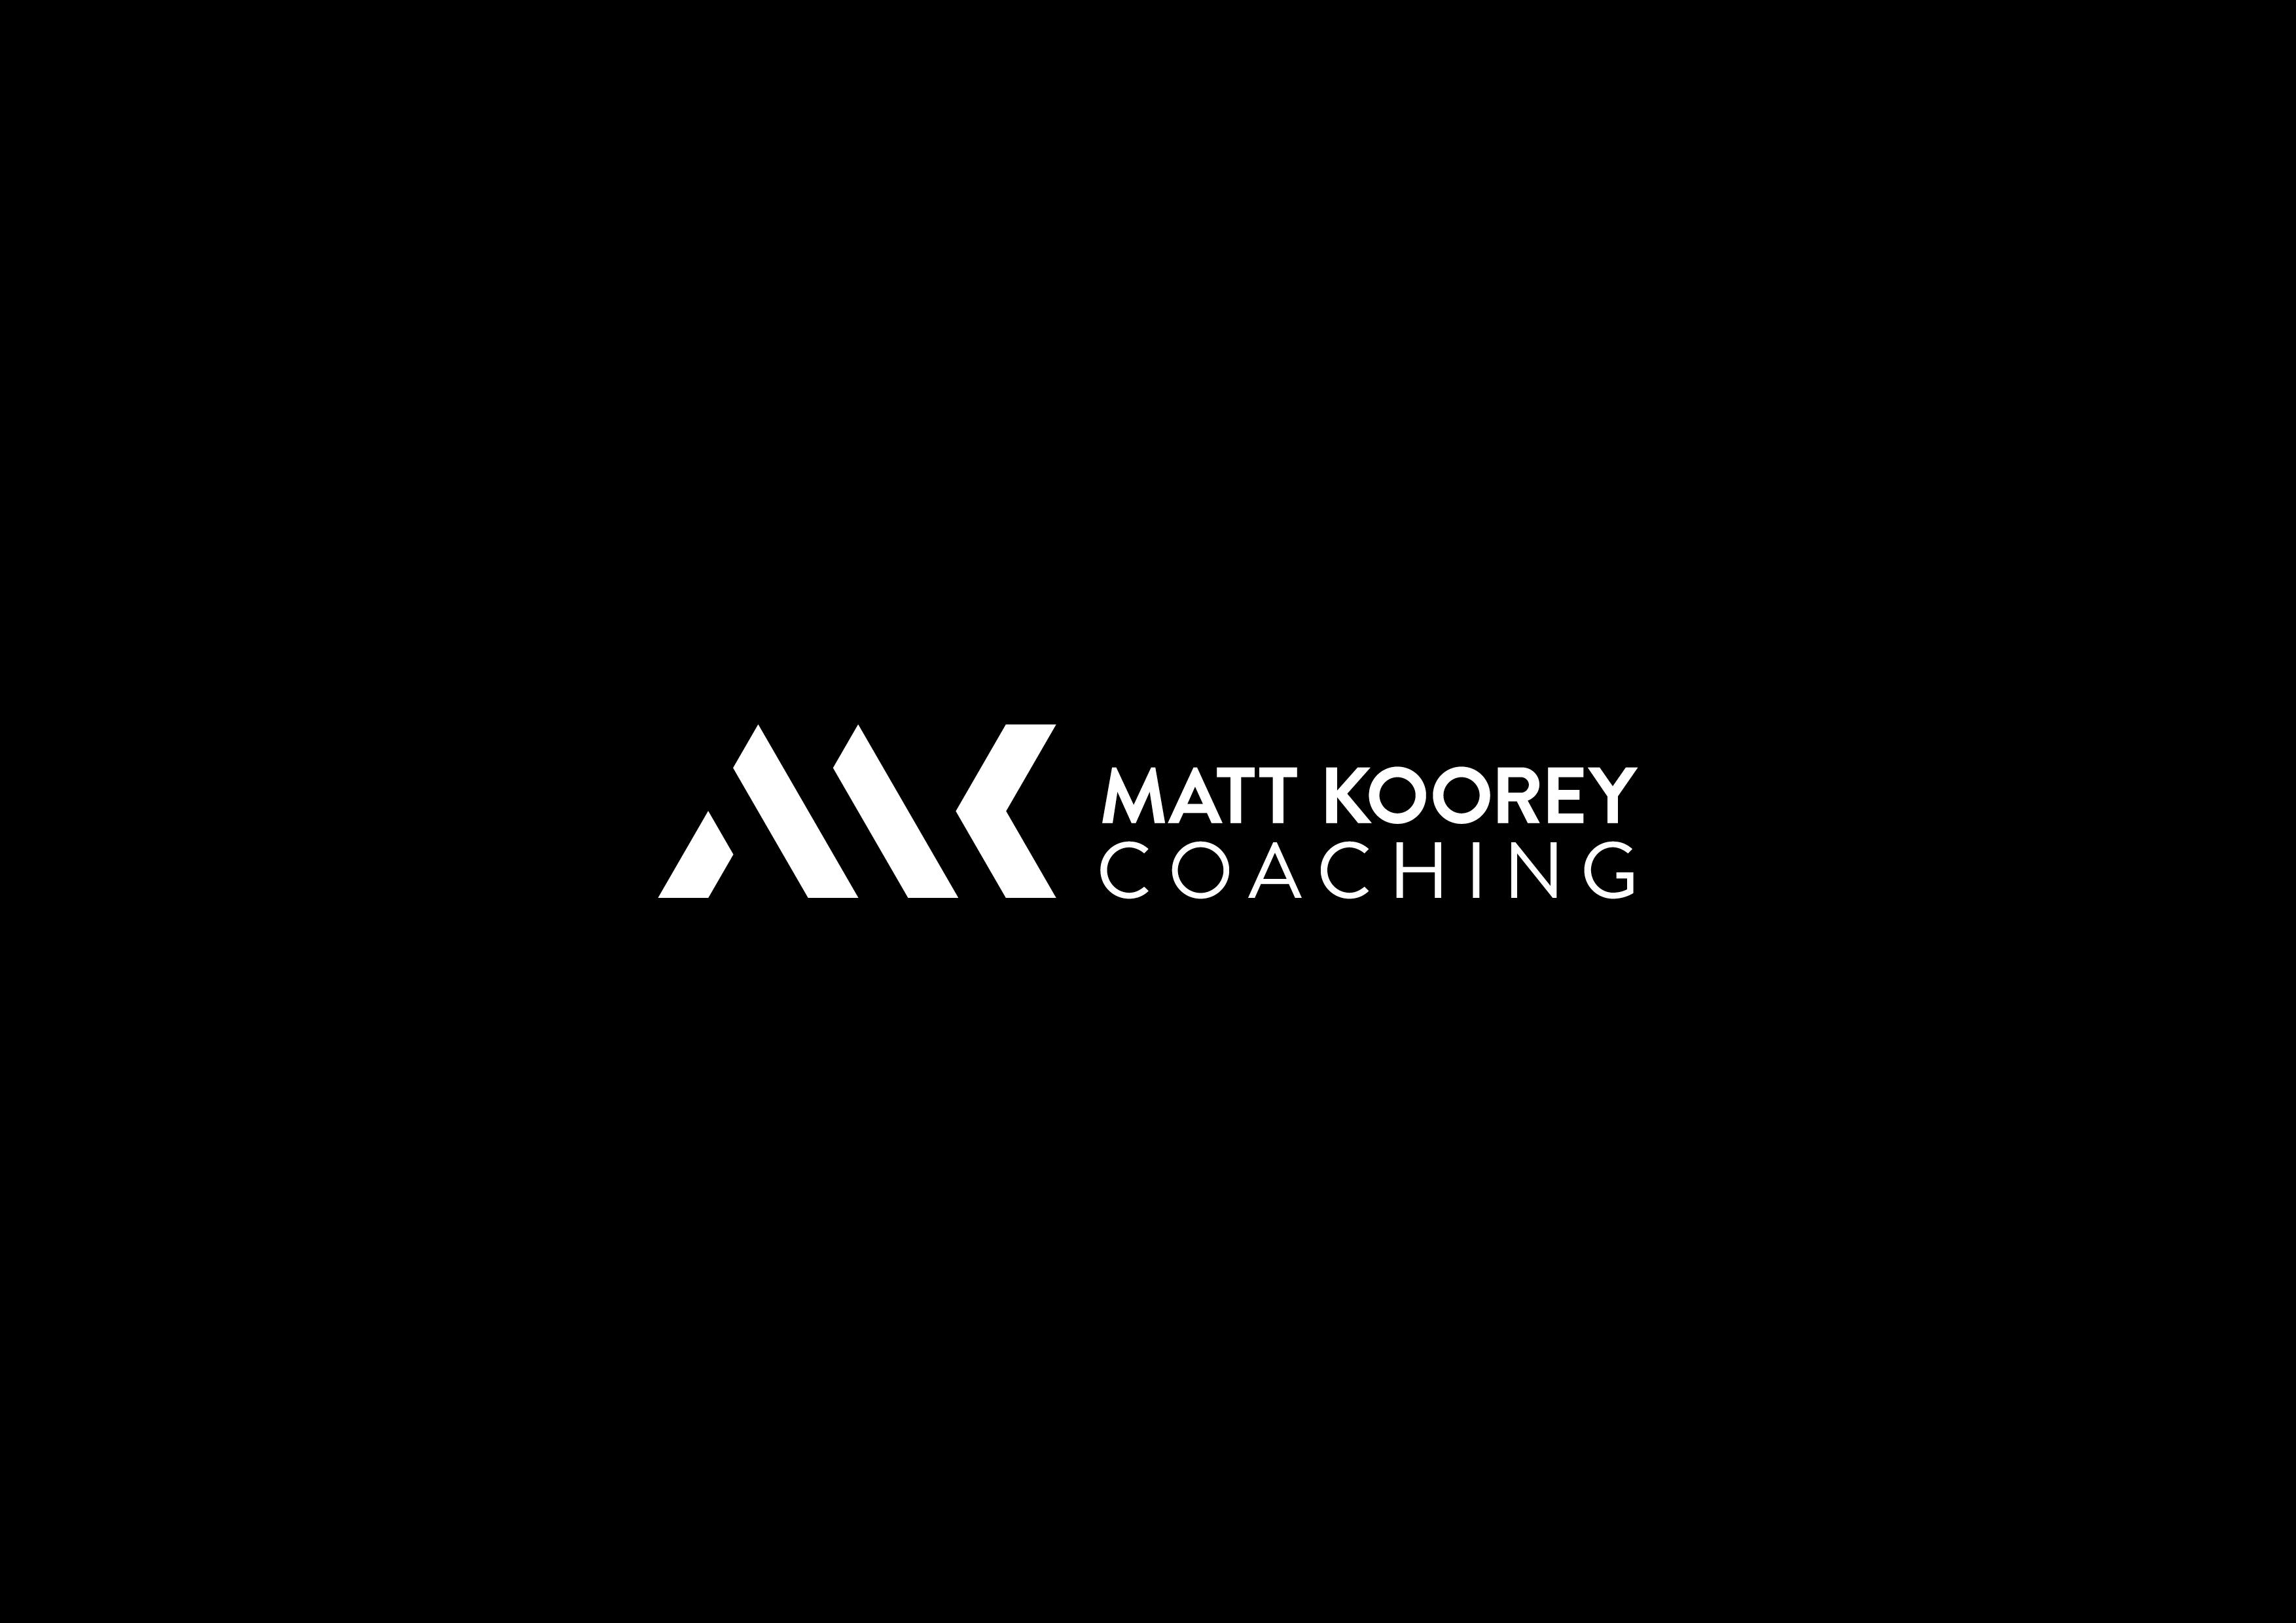 Matt Koorey Coaching logo